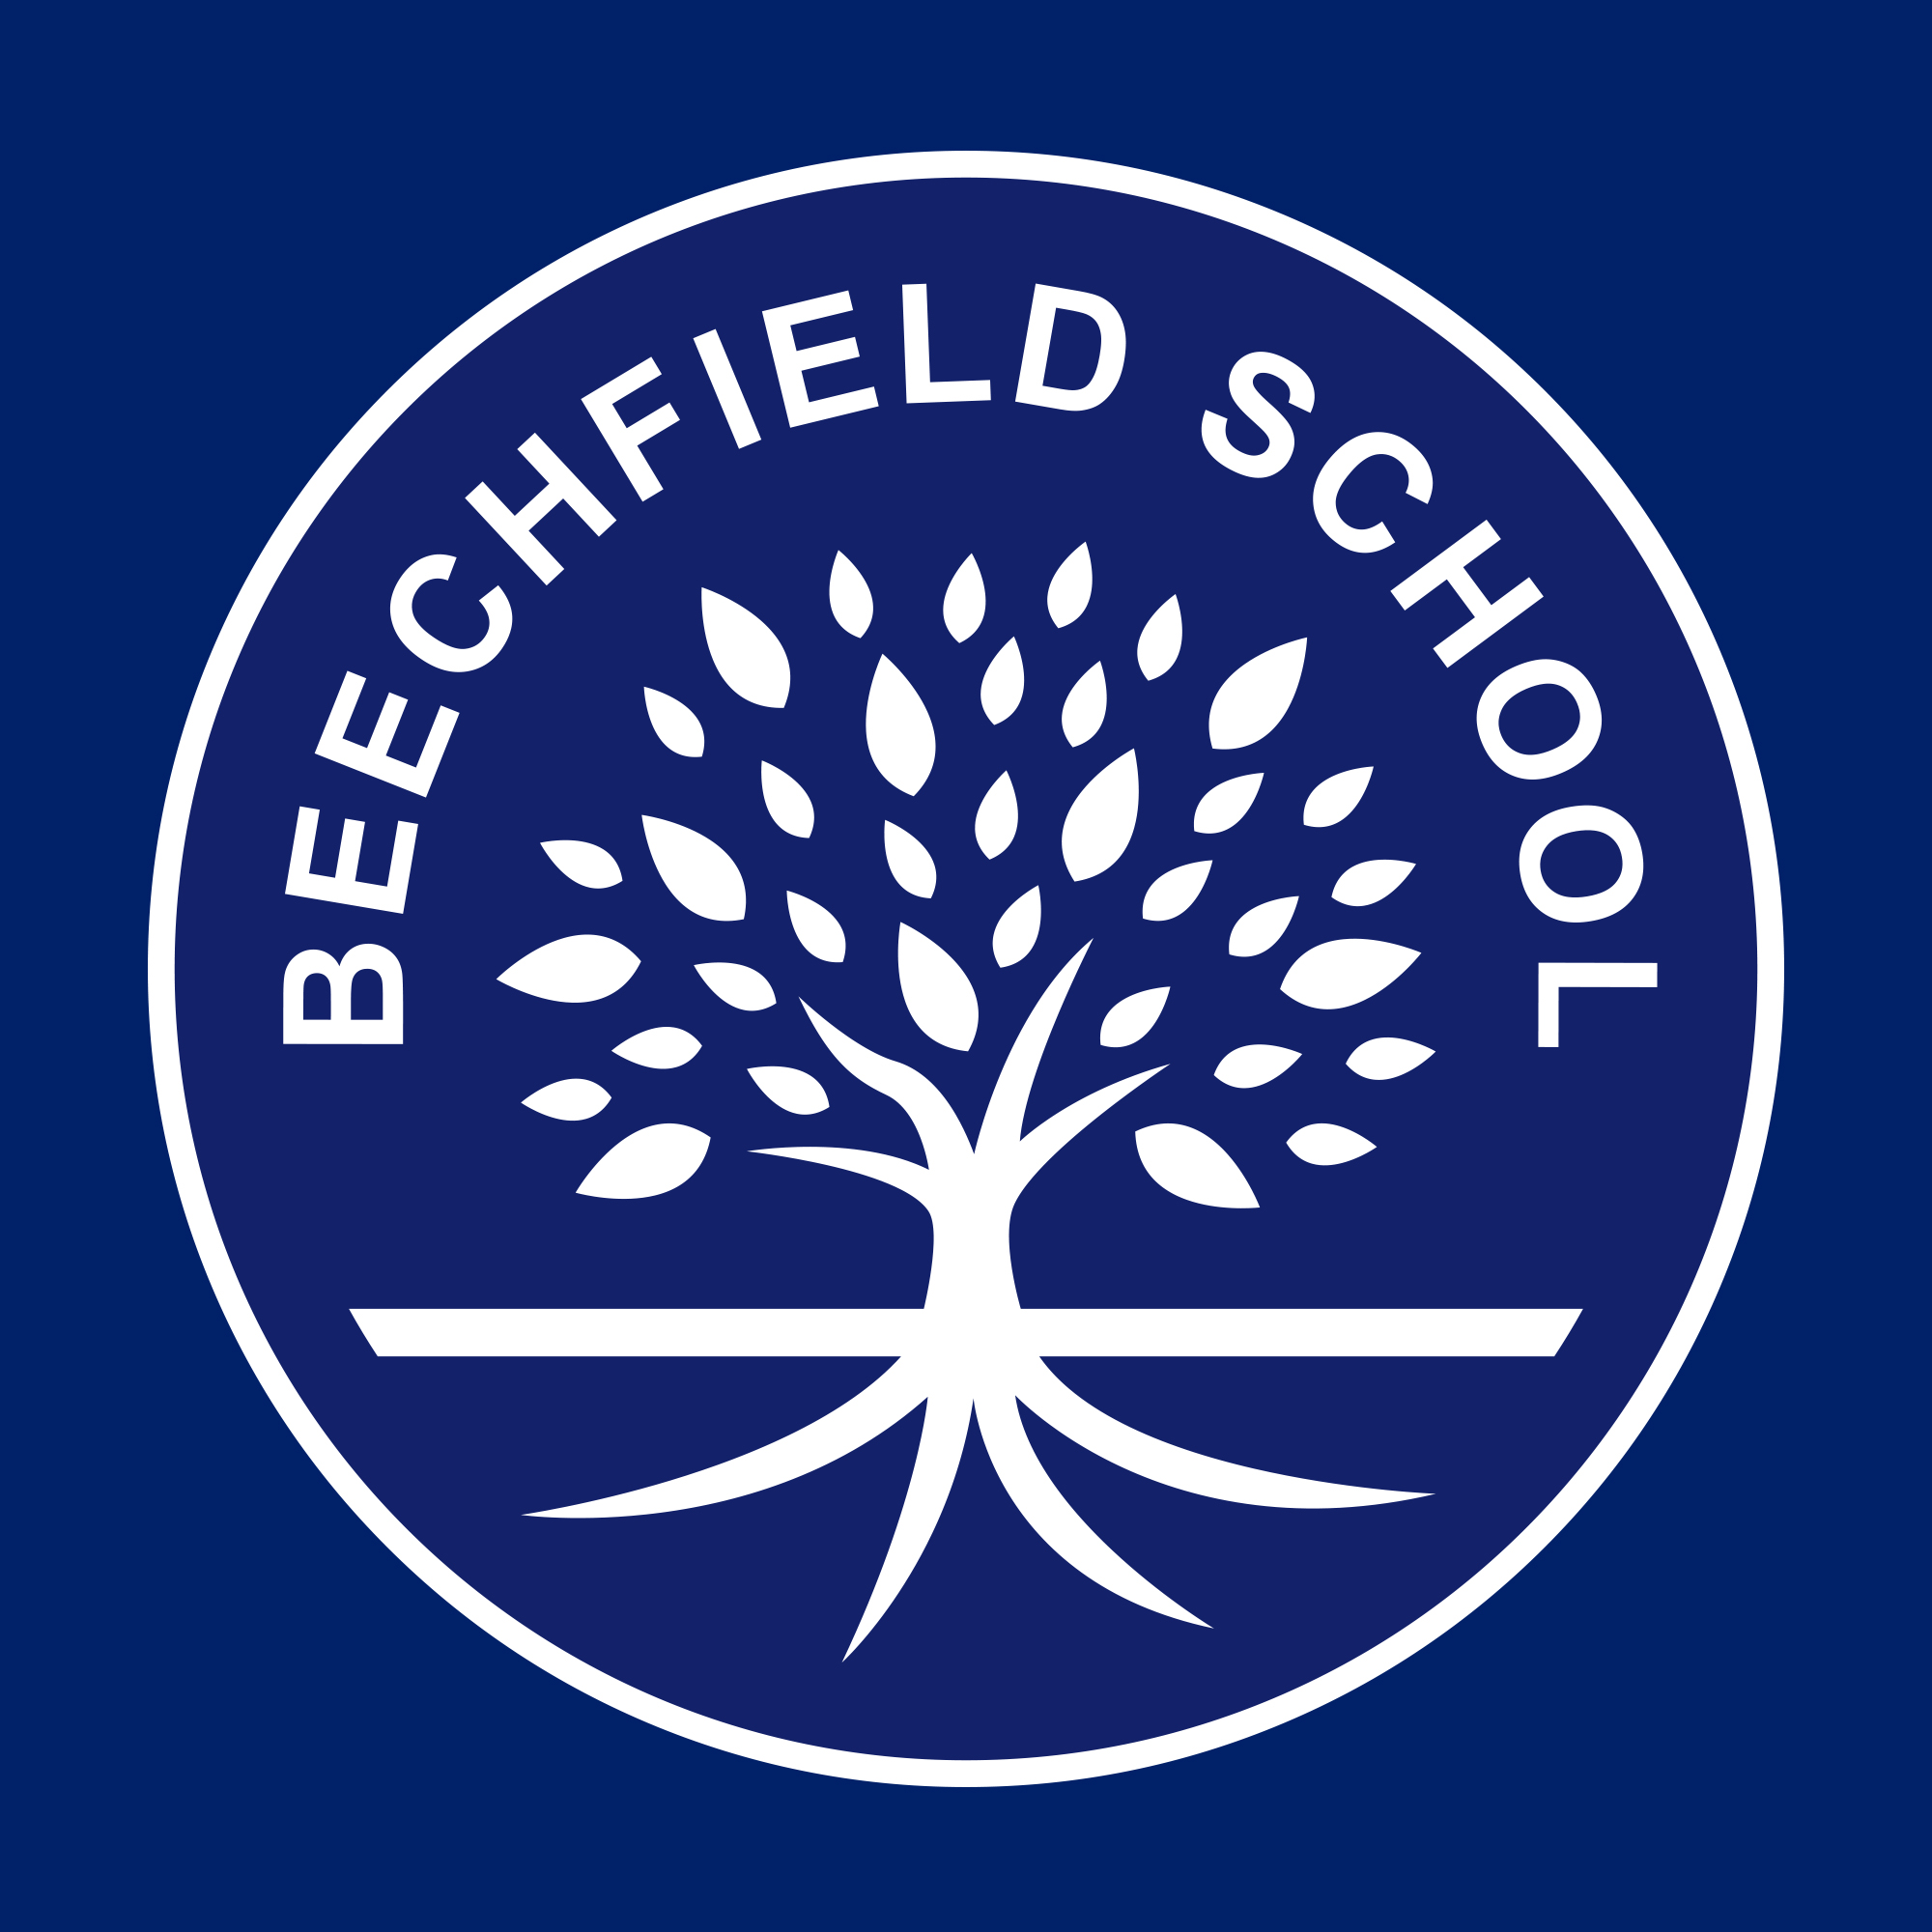 Beechfield School.png